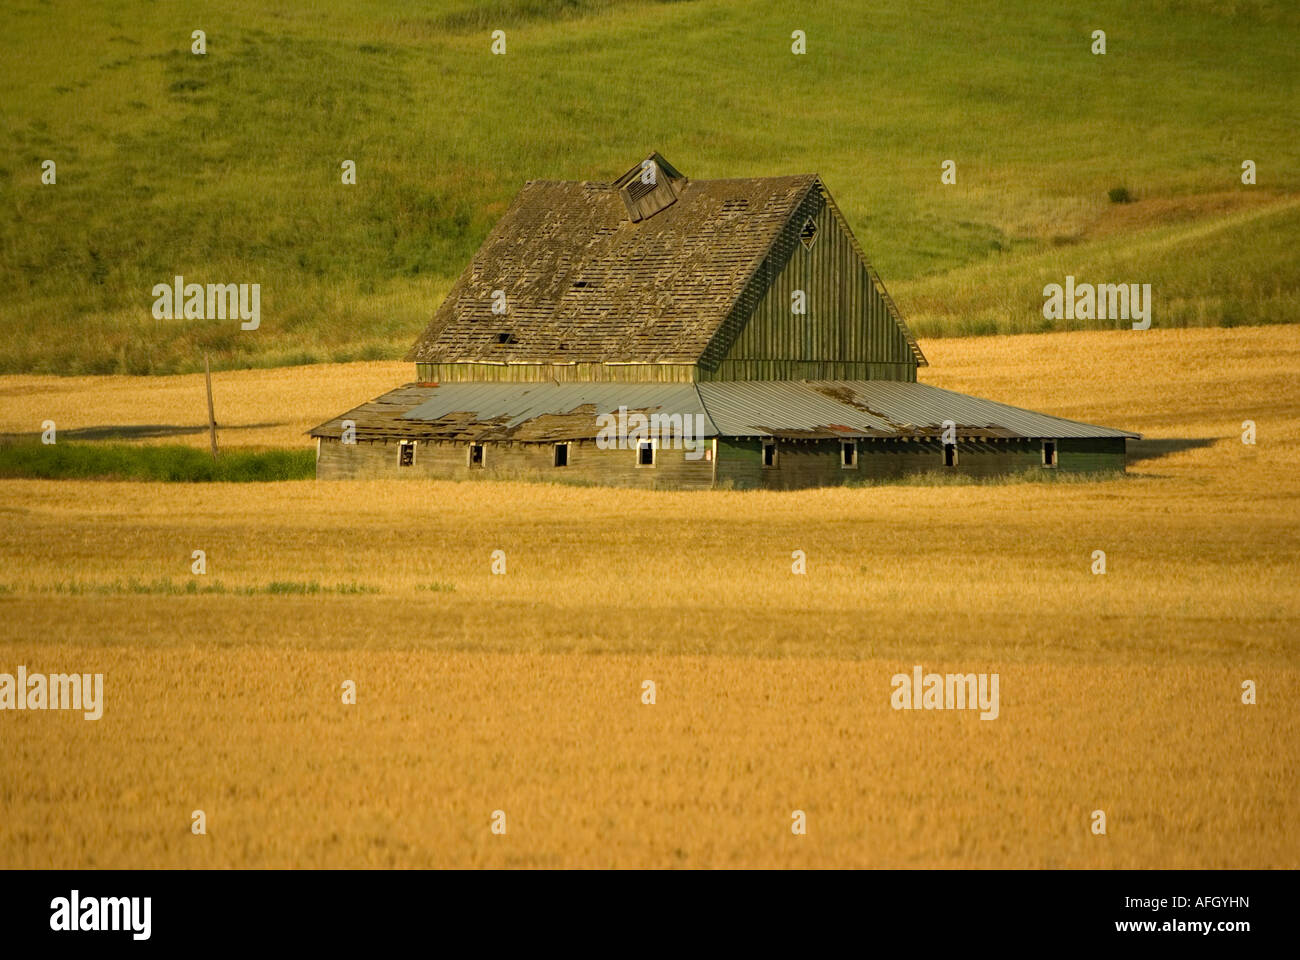 Palouse Wheat Field Eastern Washington State barn - Stock Image